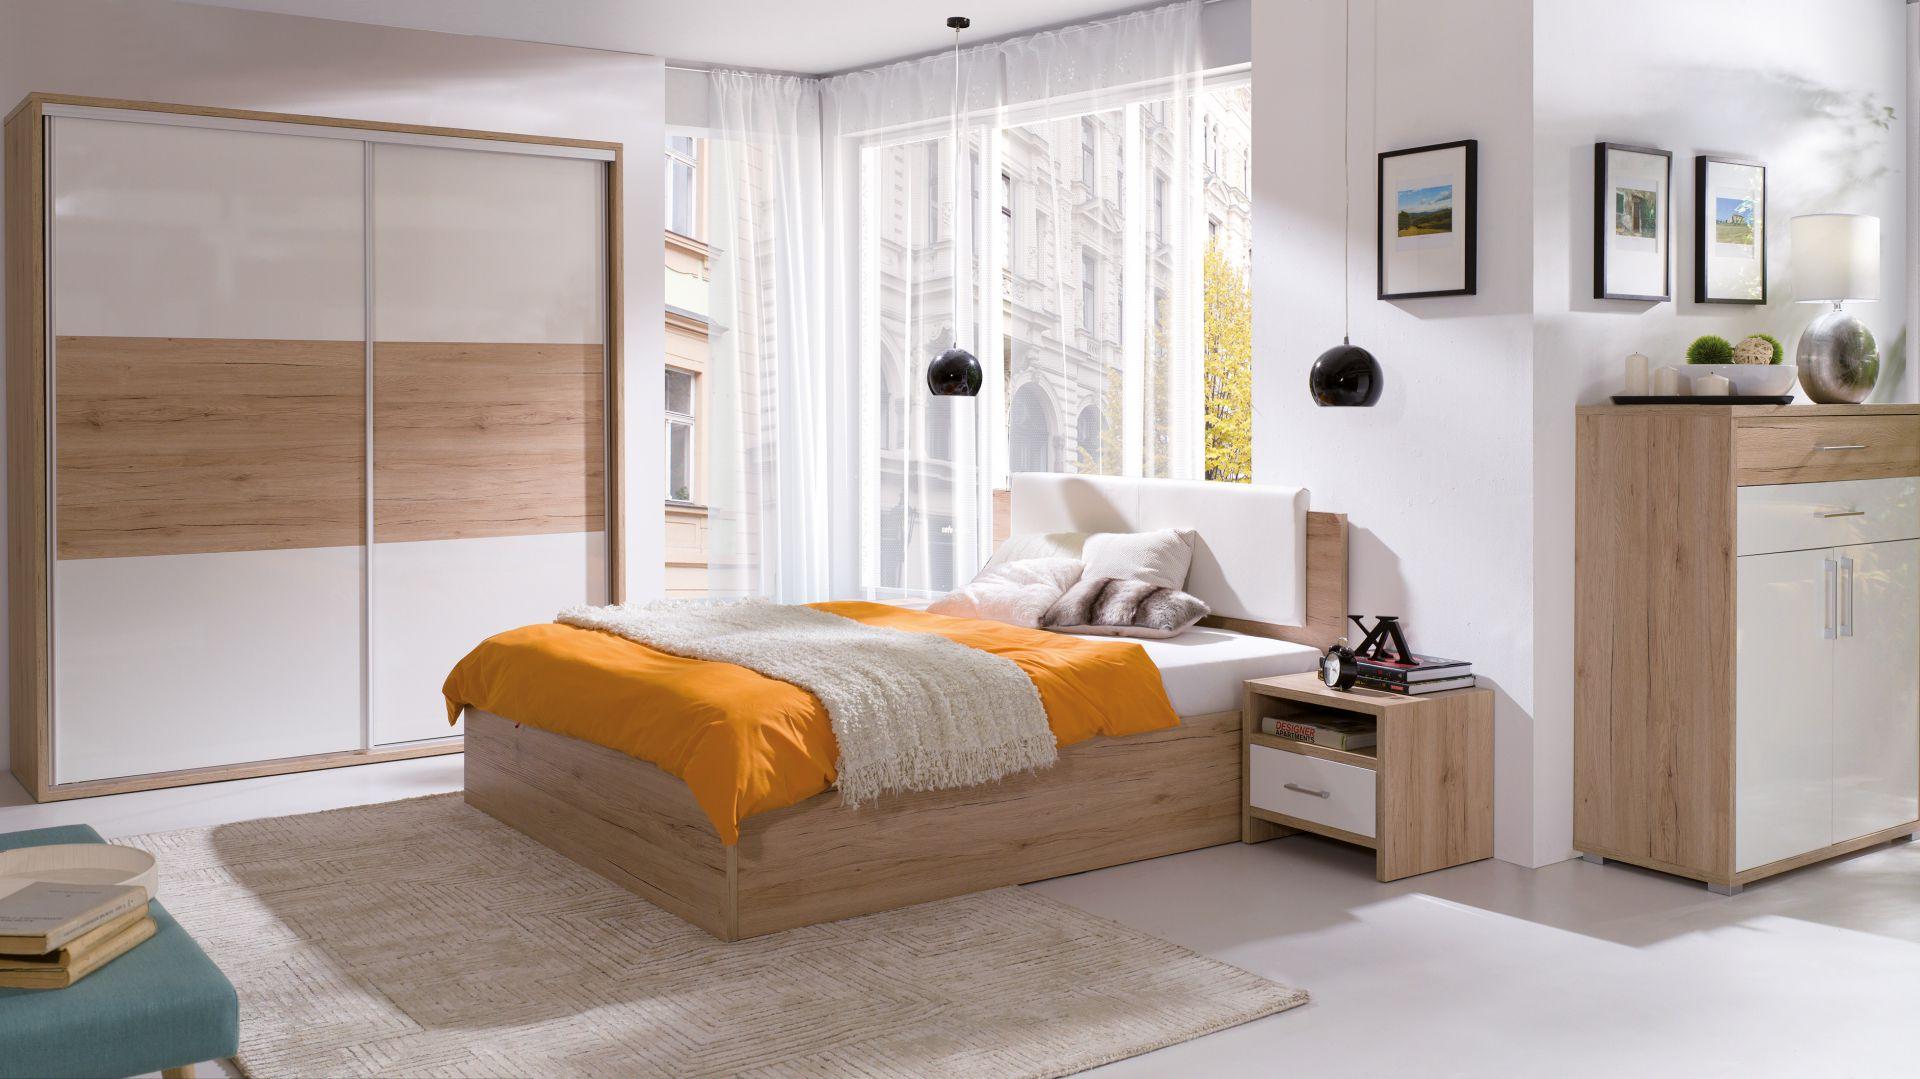 Sypialnia Pola. Fot. Wajnert Meble